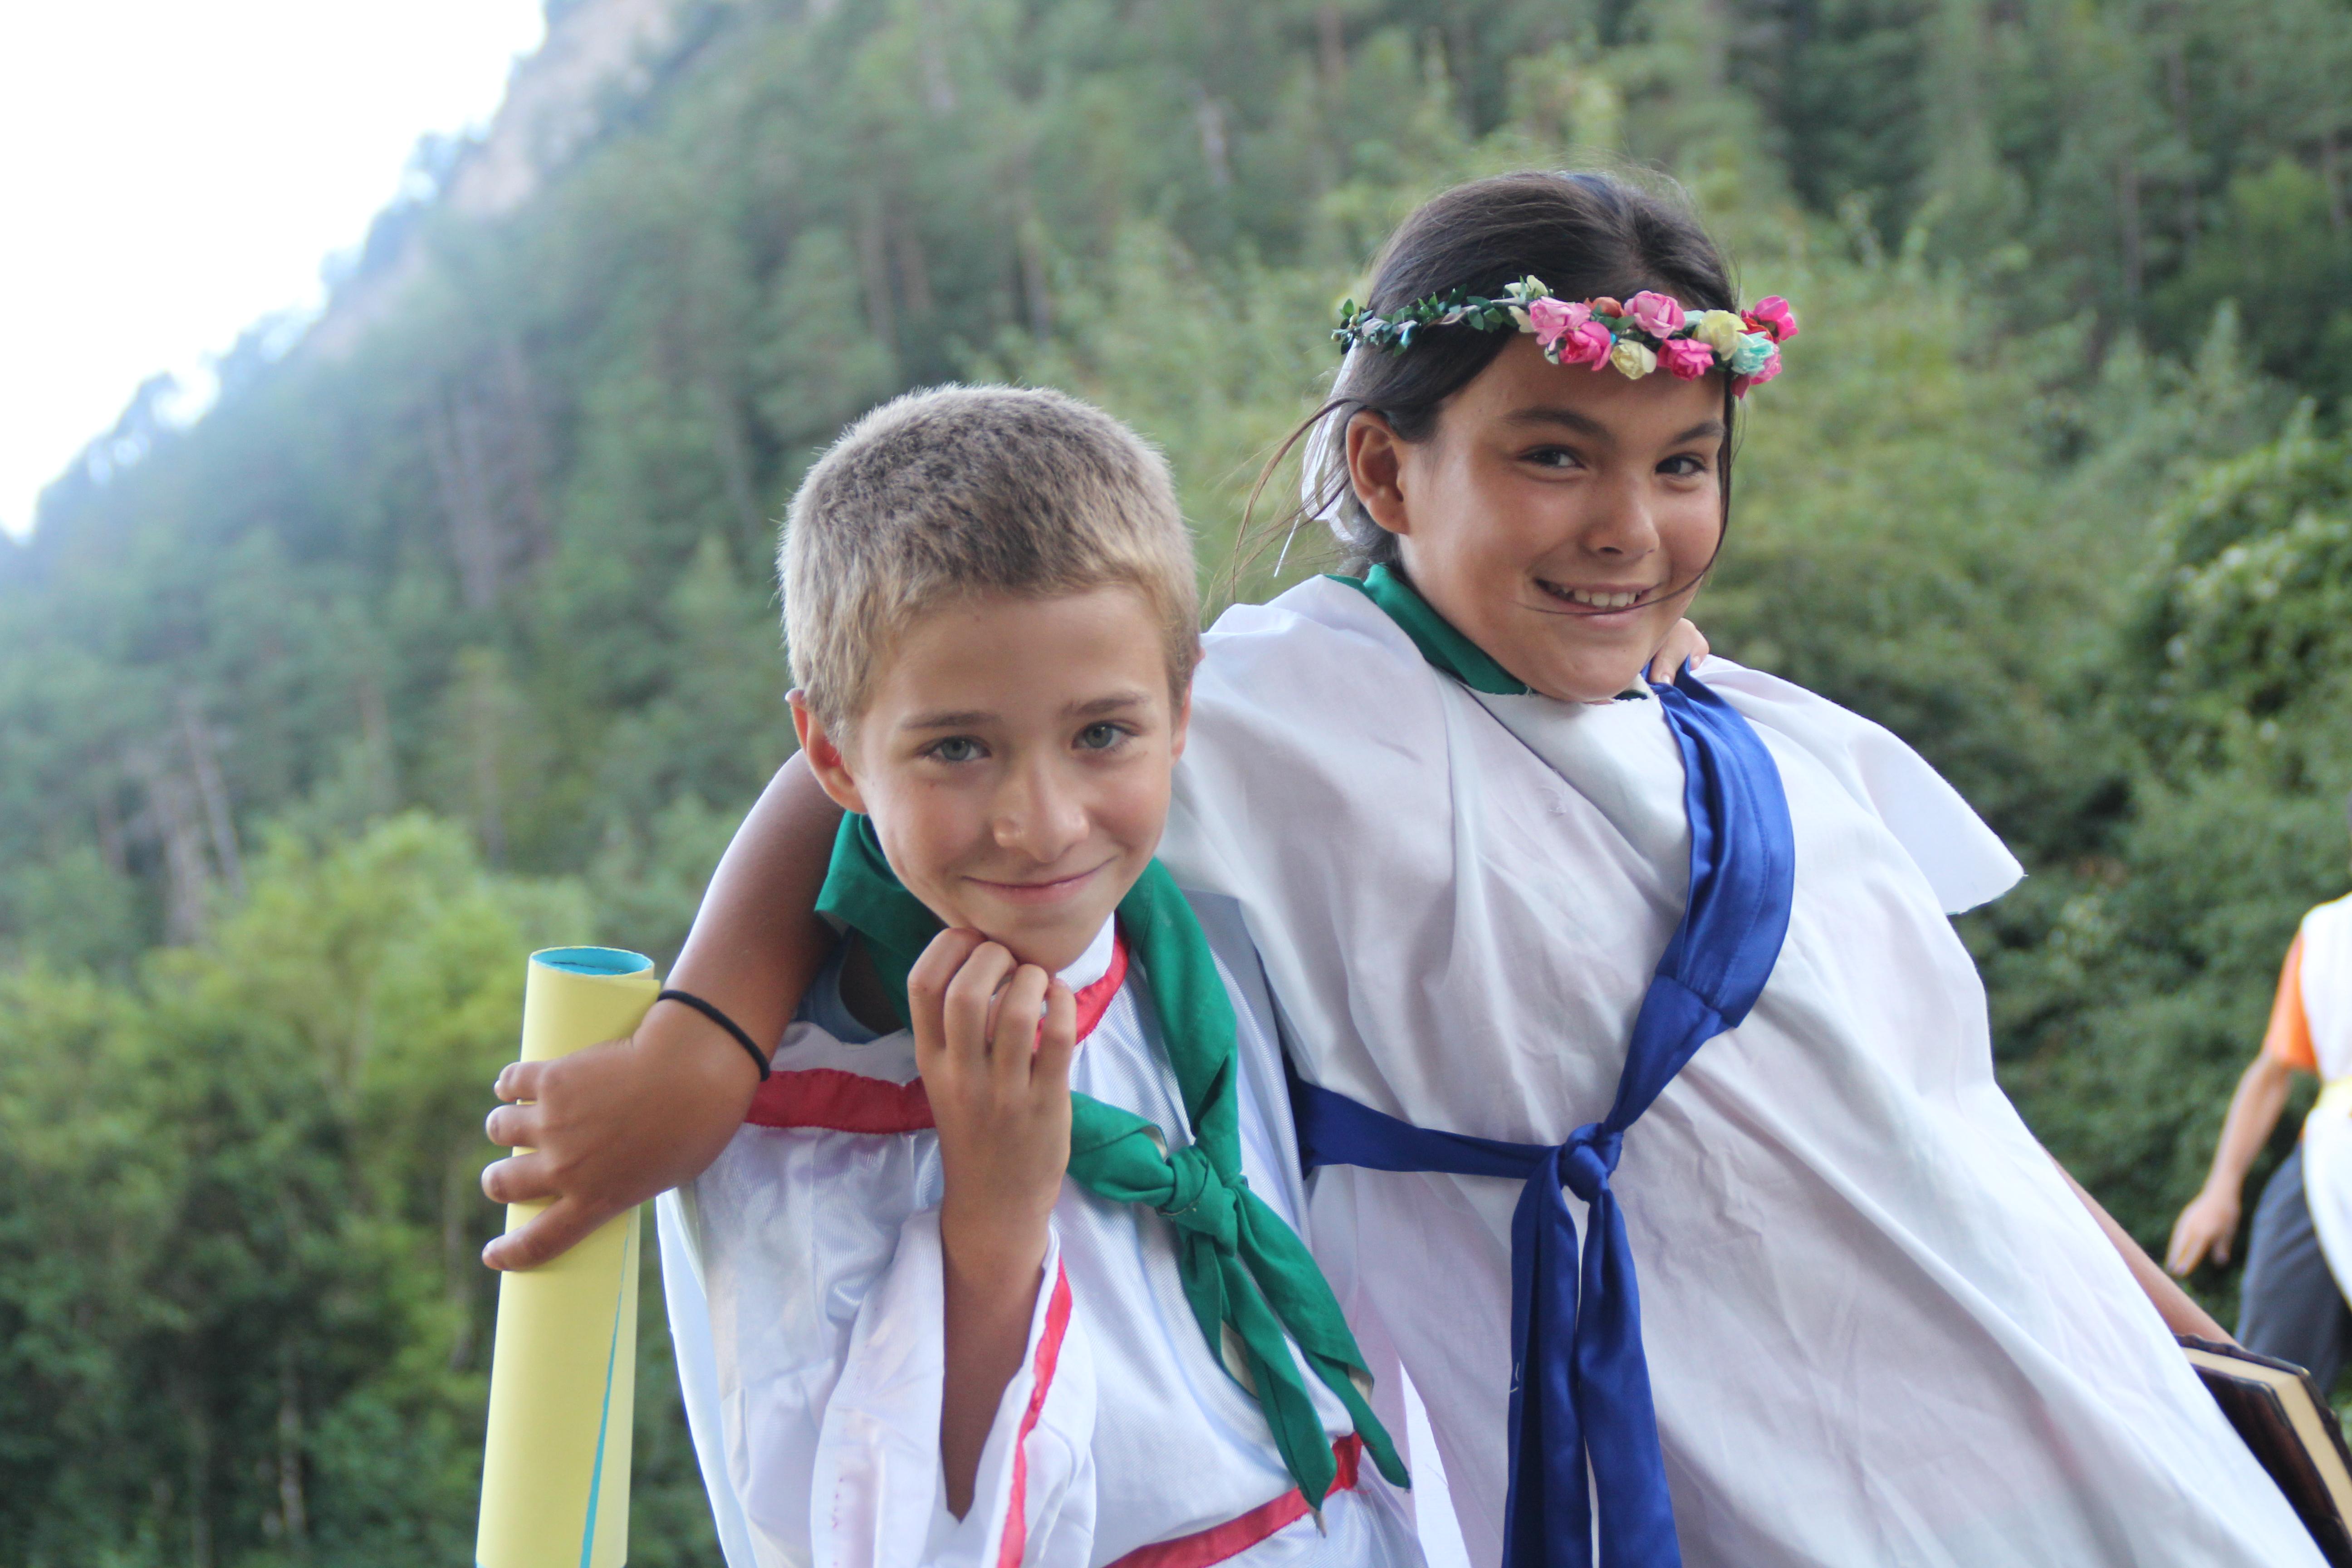 15-16 - Grupo - Campamento de verano - P265